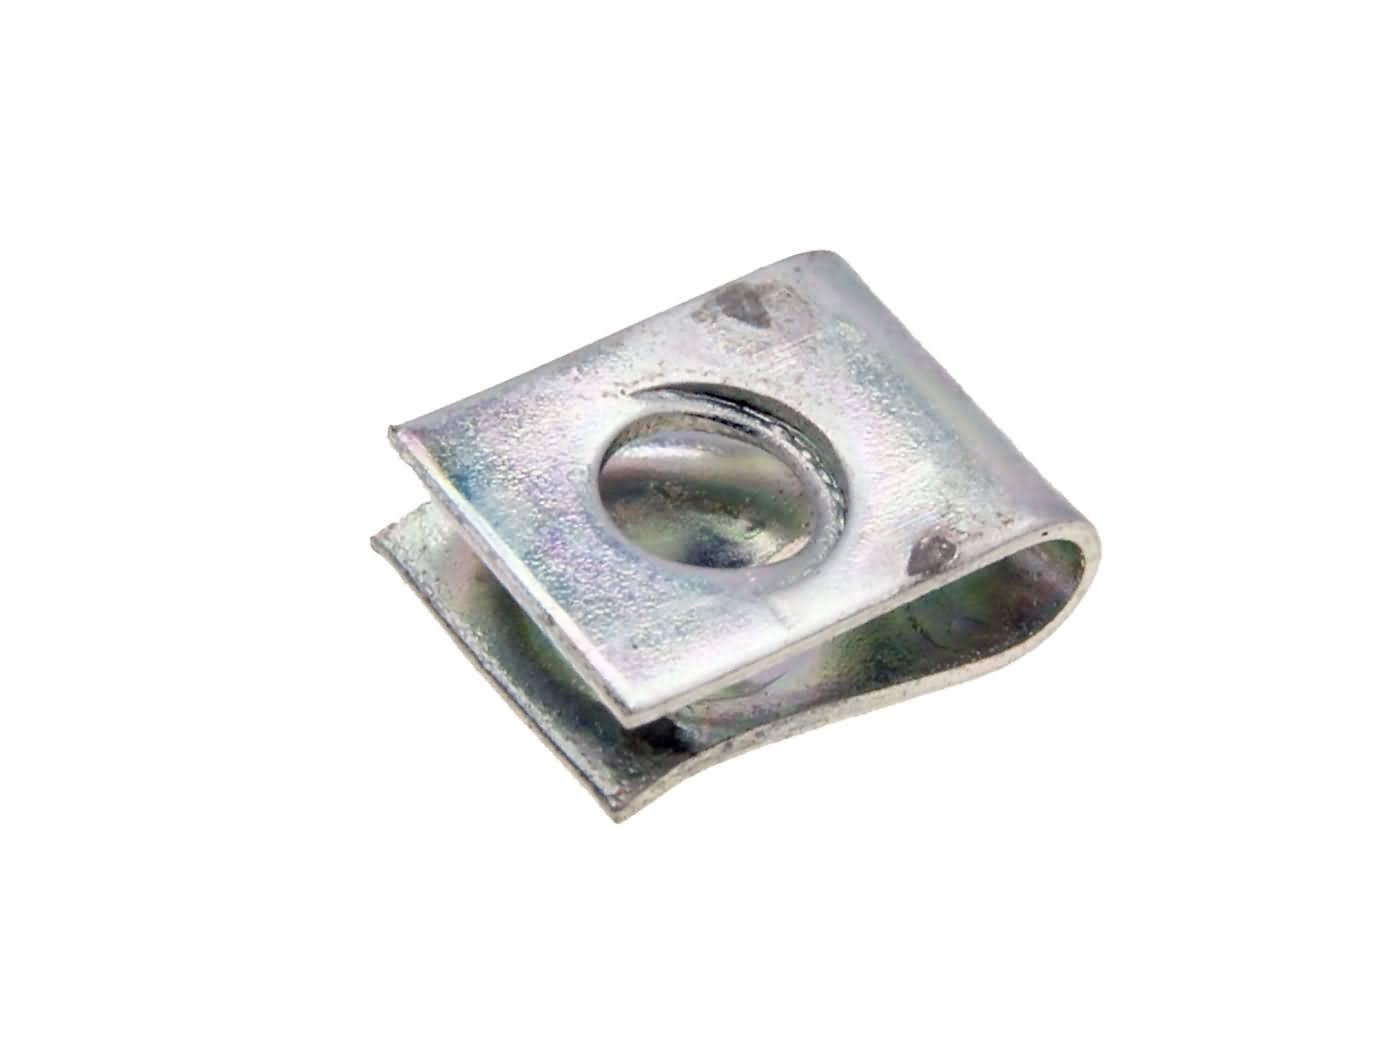 hight resolution of body speed nut plate nut 9x12 5 3 5mm wood thread